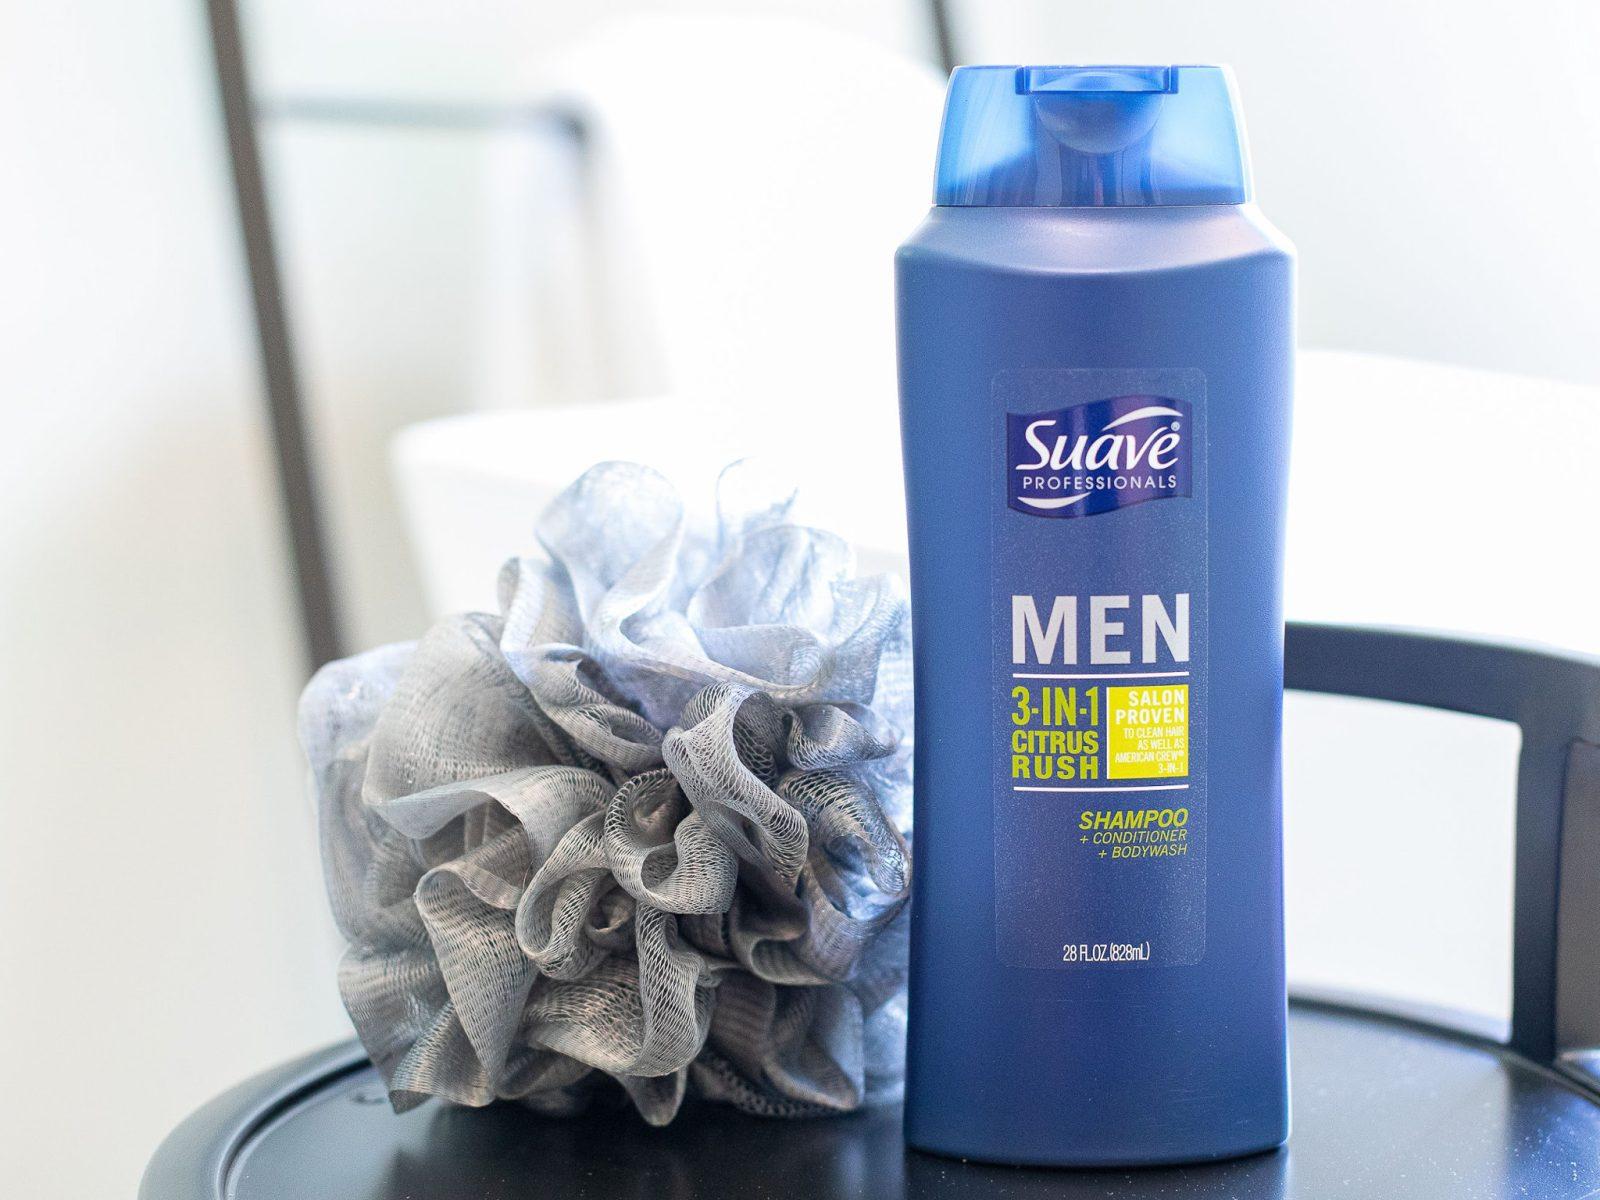 Suave Men Hair Care Just $2.79 At Publix (Regular $4.79) on I Heart Publix 1